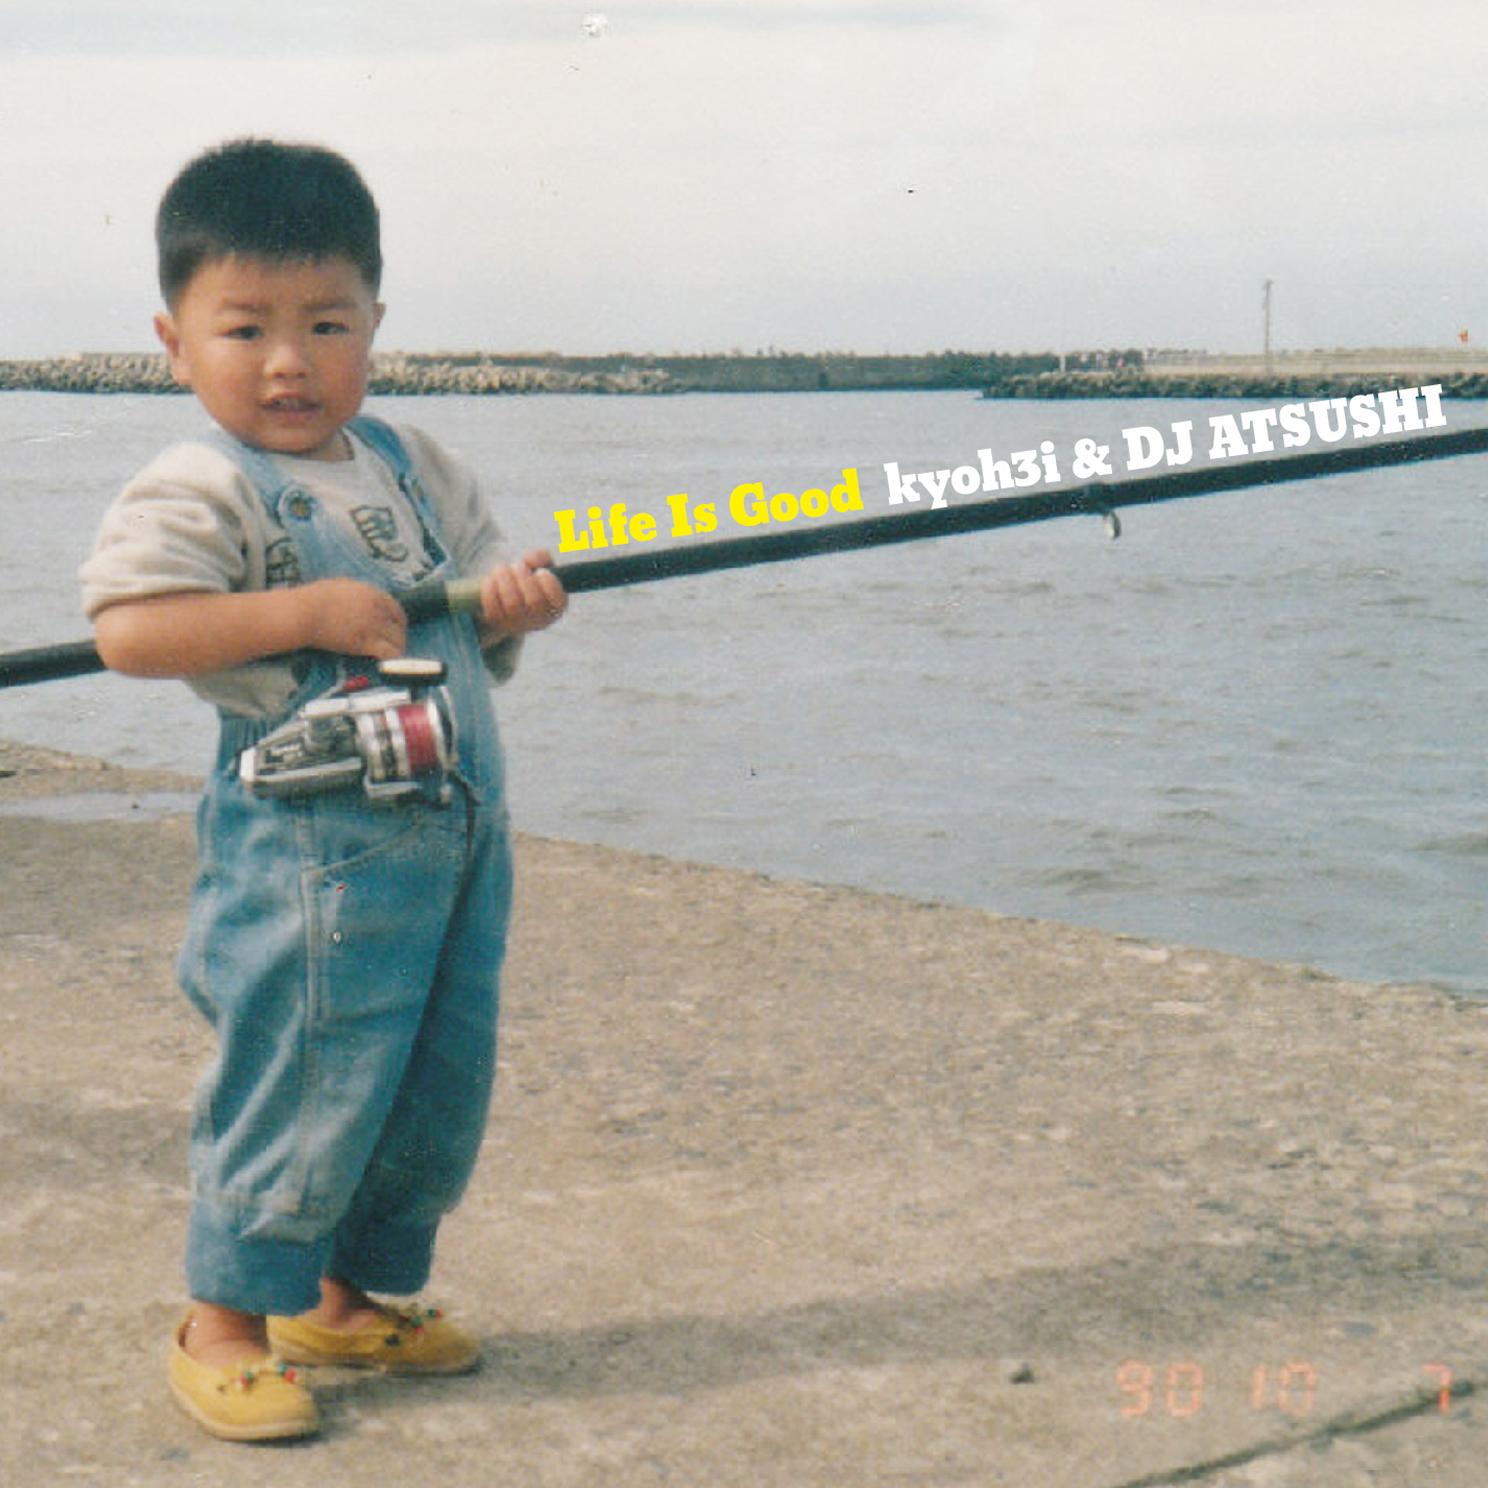 kyoh3i & DJ ATSUSHI -